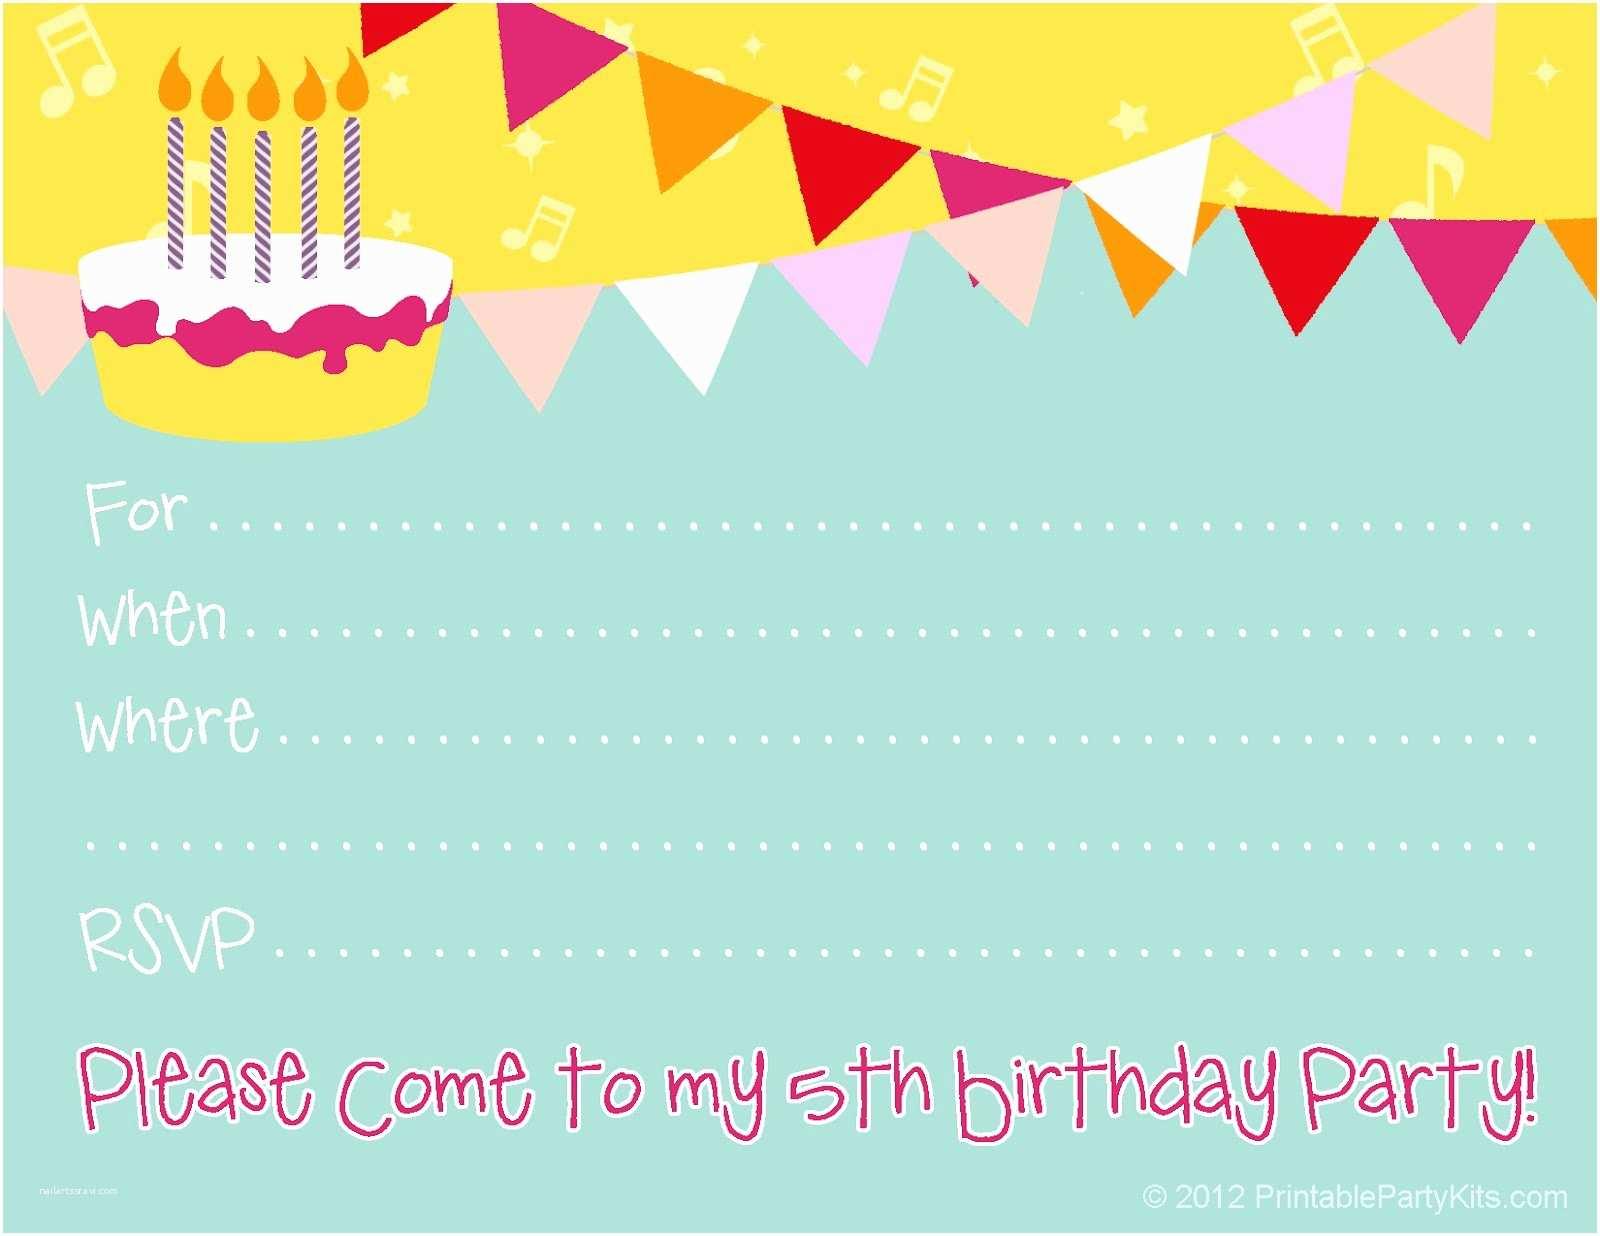 Party Invitation Sample Free Birthday Party Invitations for Girl – Bagvania Free